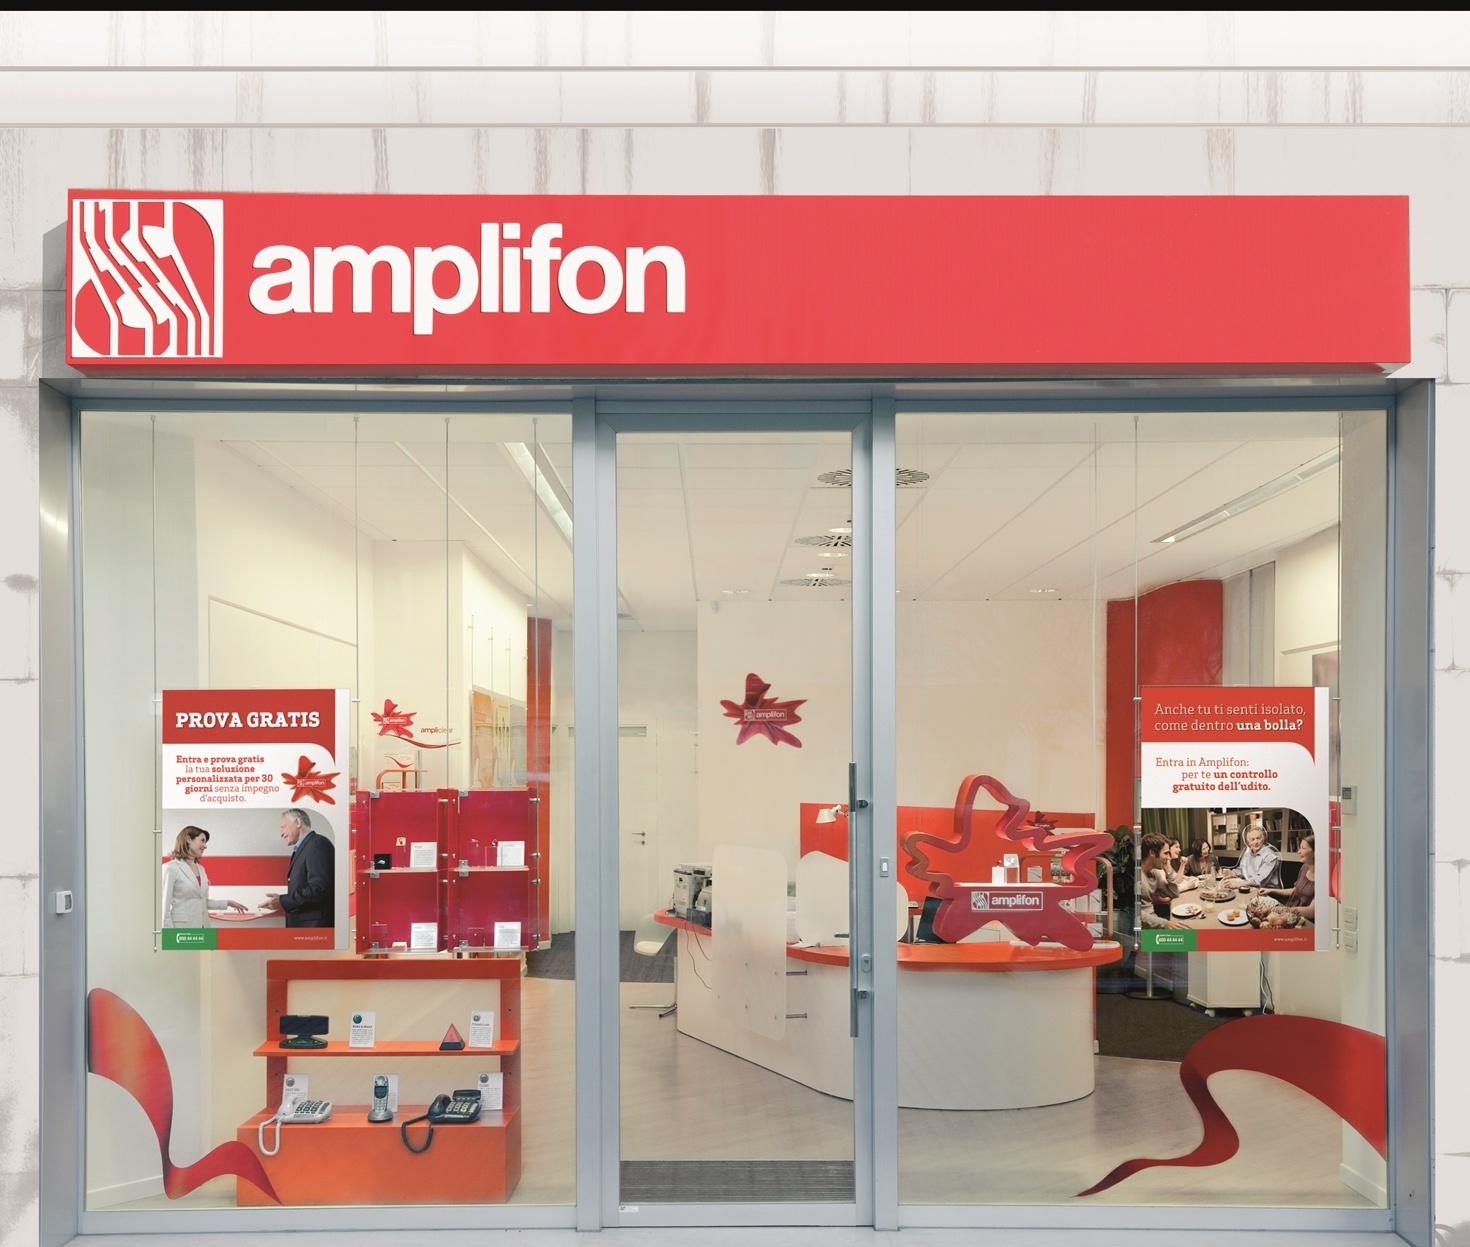 Amplifon_Point_of_Sale_POS.jpg